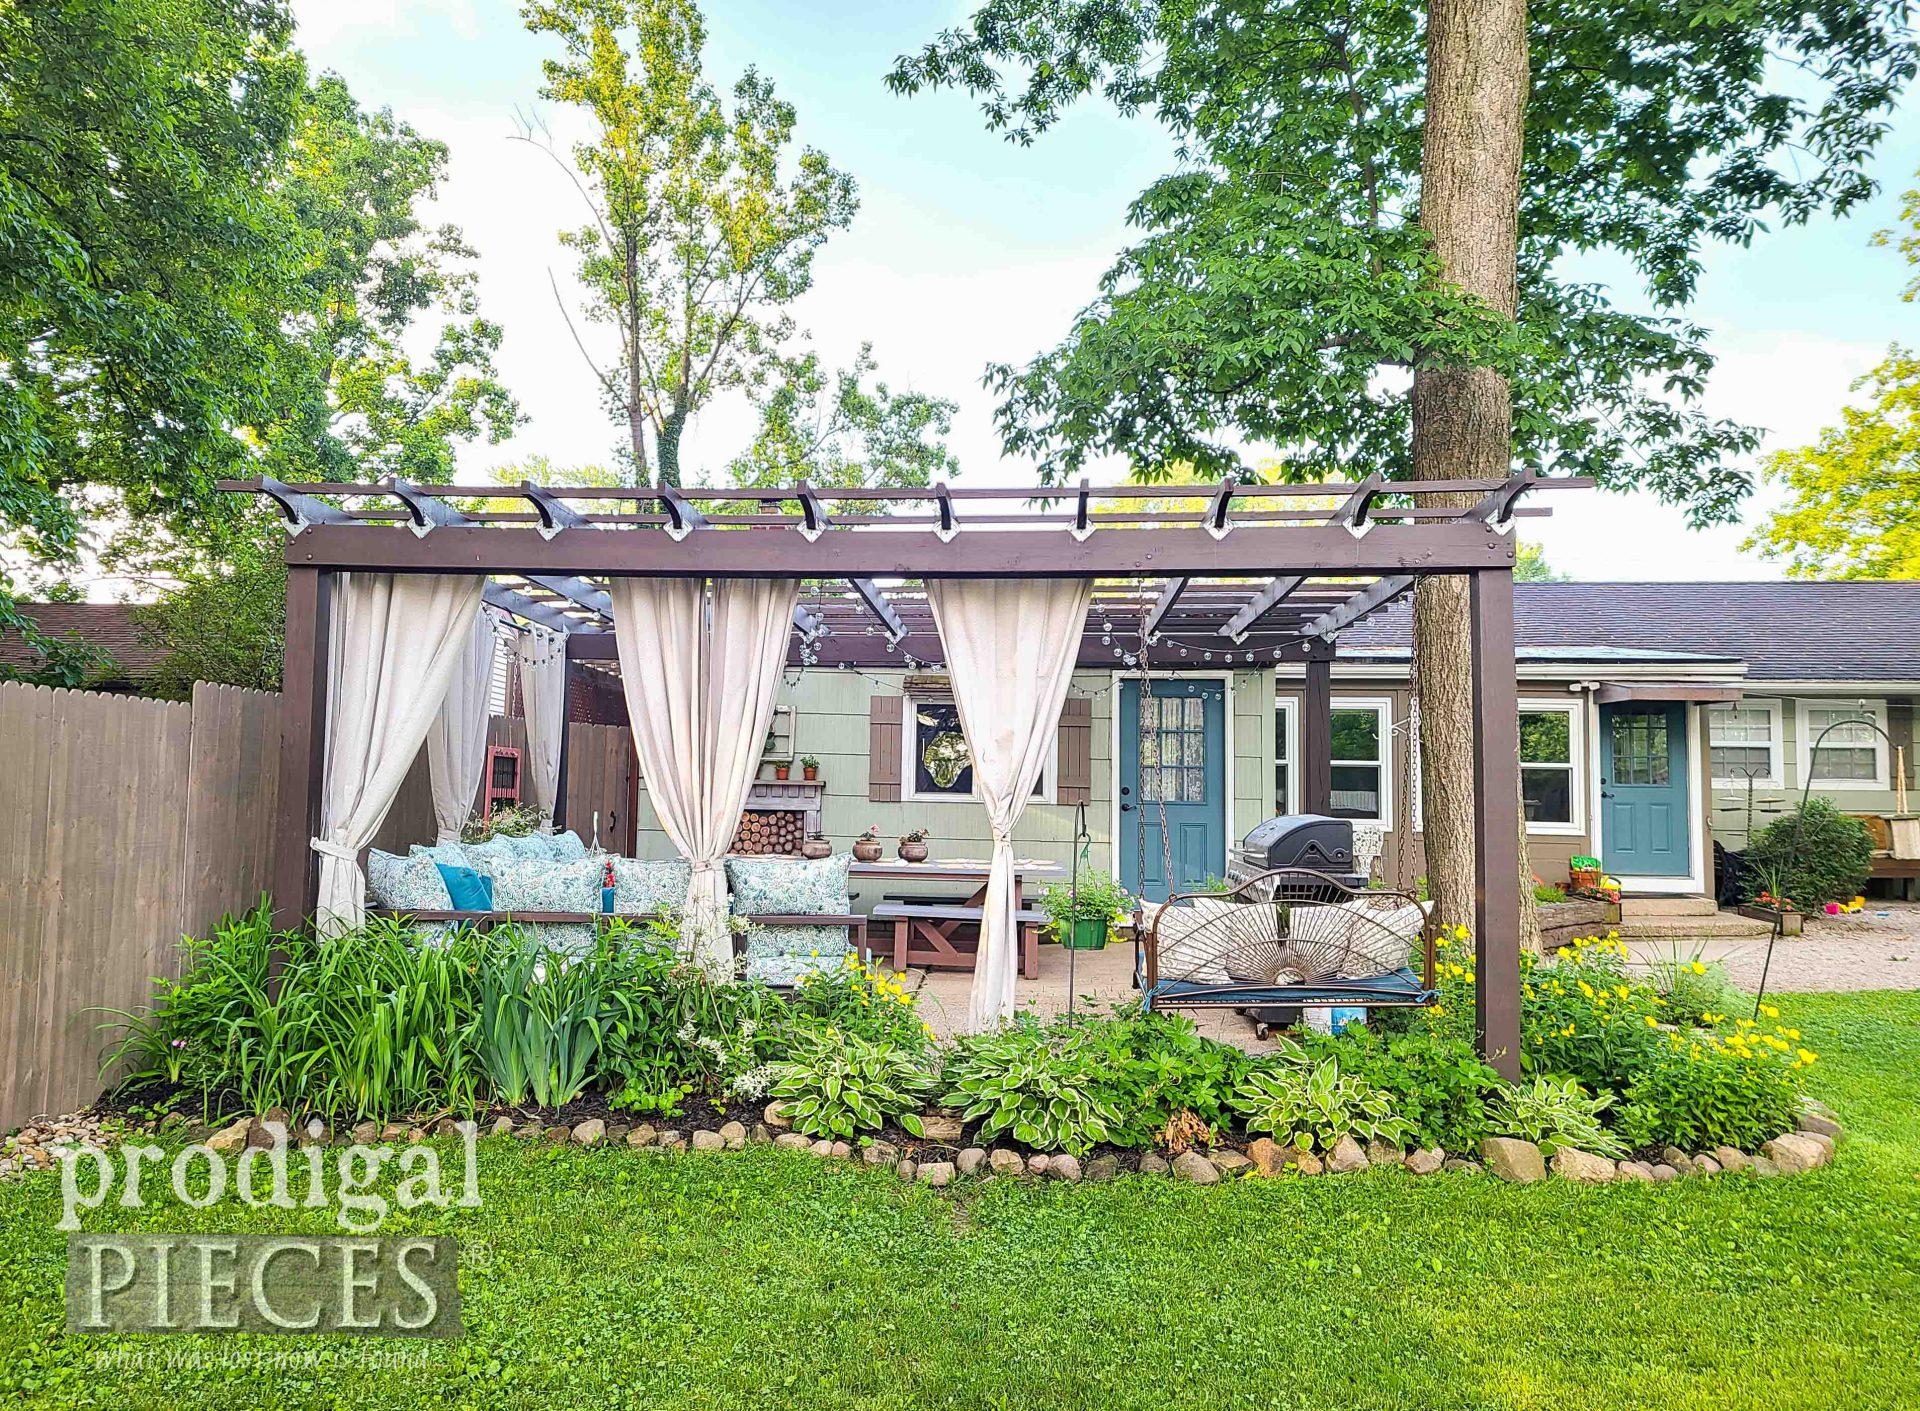 Side View Patio Pergola by Larissa of Prodigal Pieces | prodigalpieces.com #prodigalpieces #patio #diy #backyard #summer